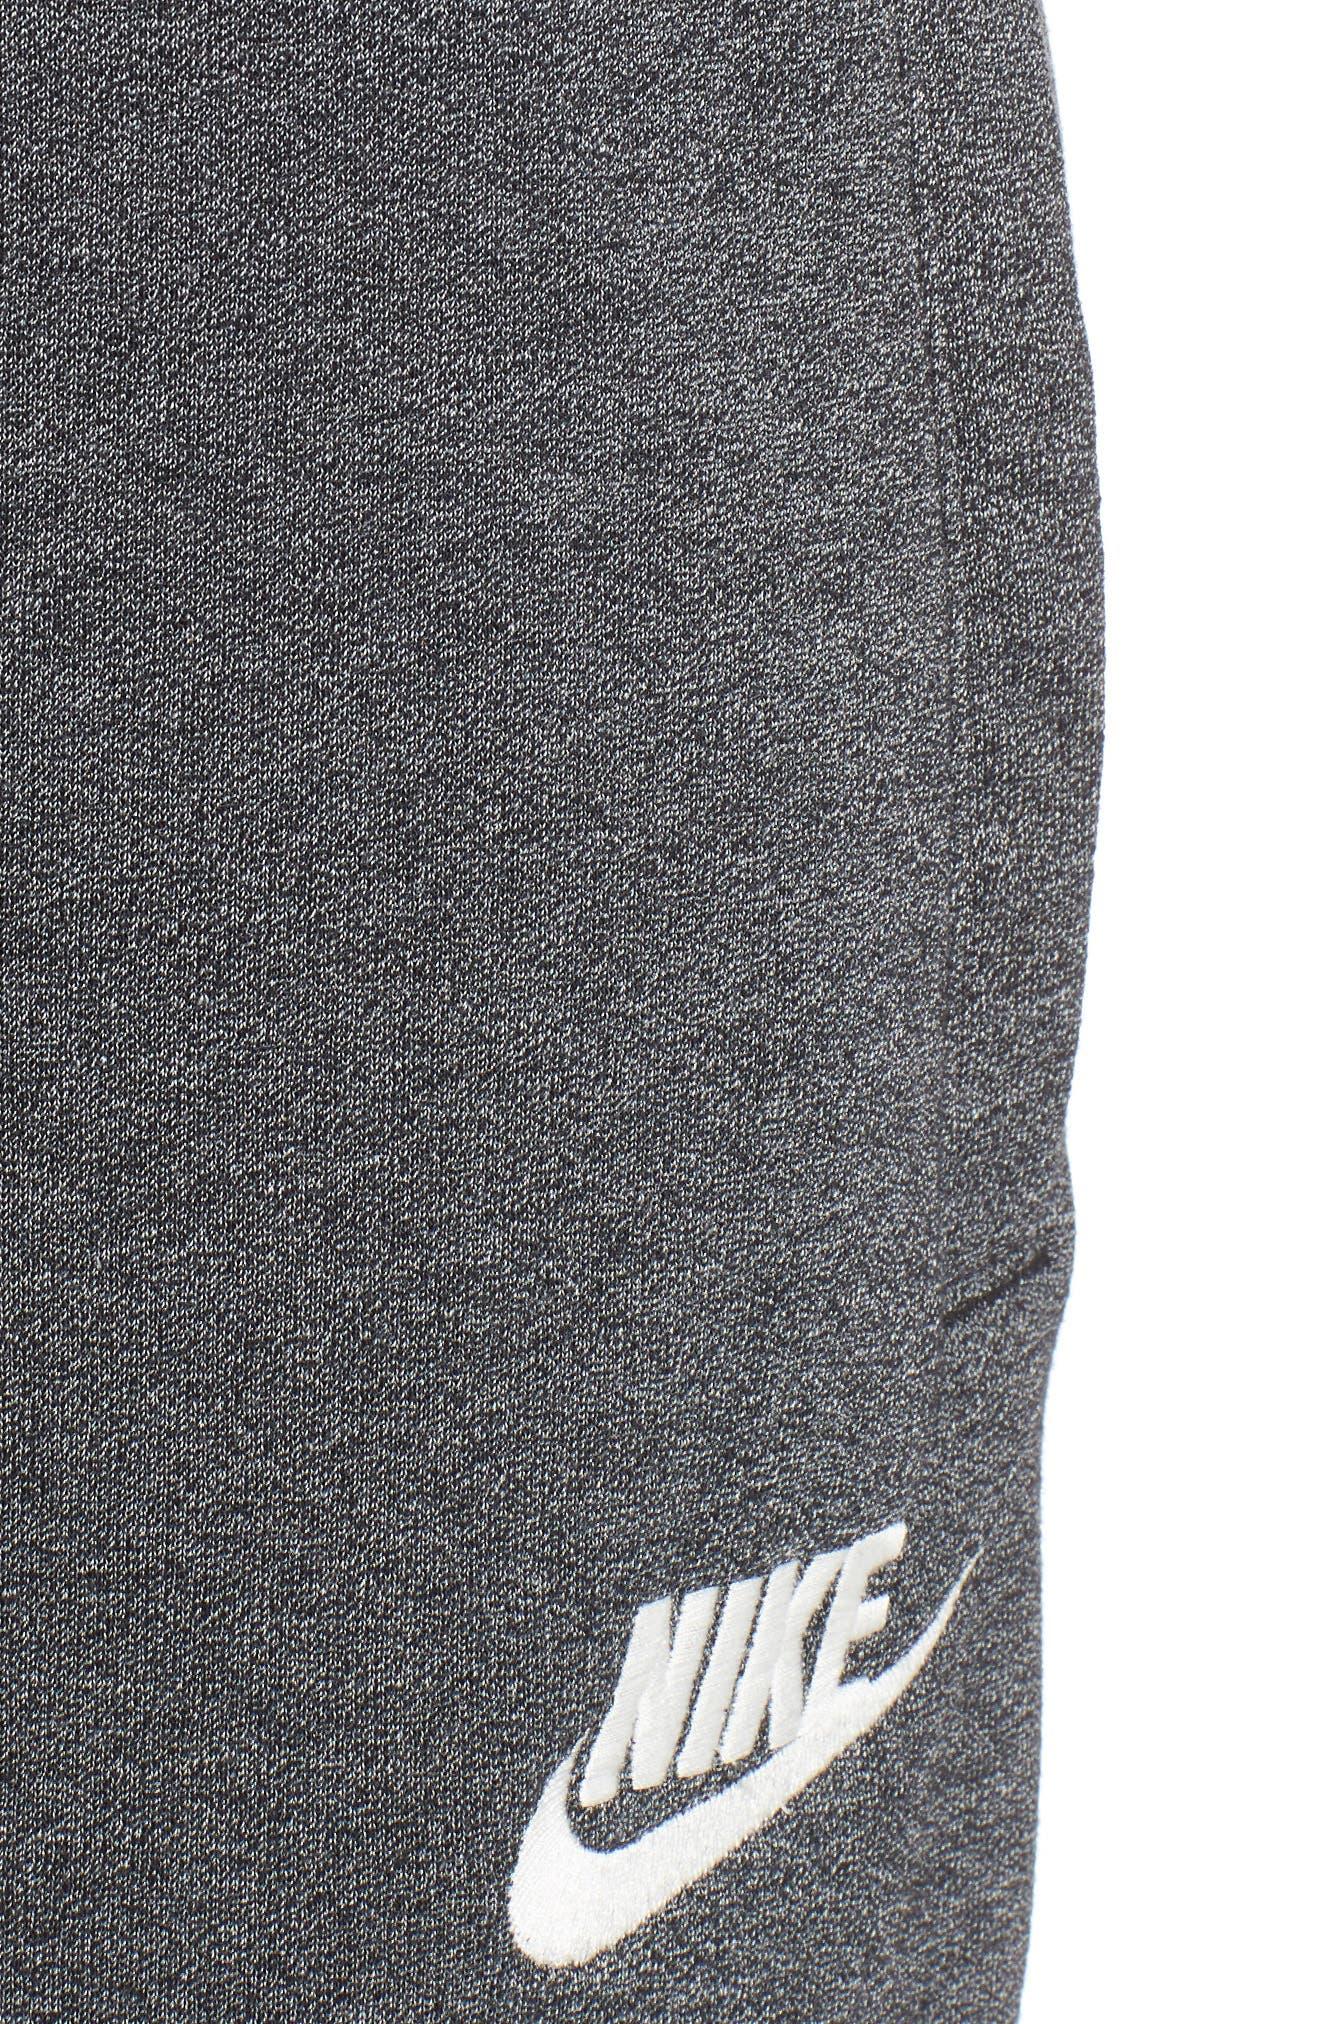 Sportswear ACG Heritage Pants,                             Alternate thumbnail 4, color,                             BLACK/ HTR/ SAIL